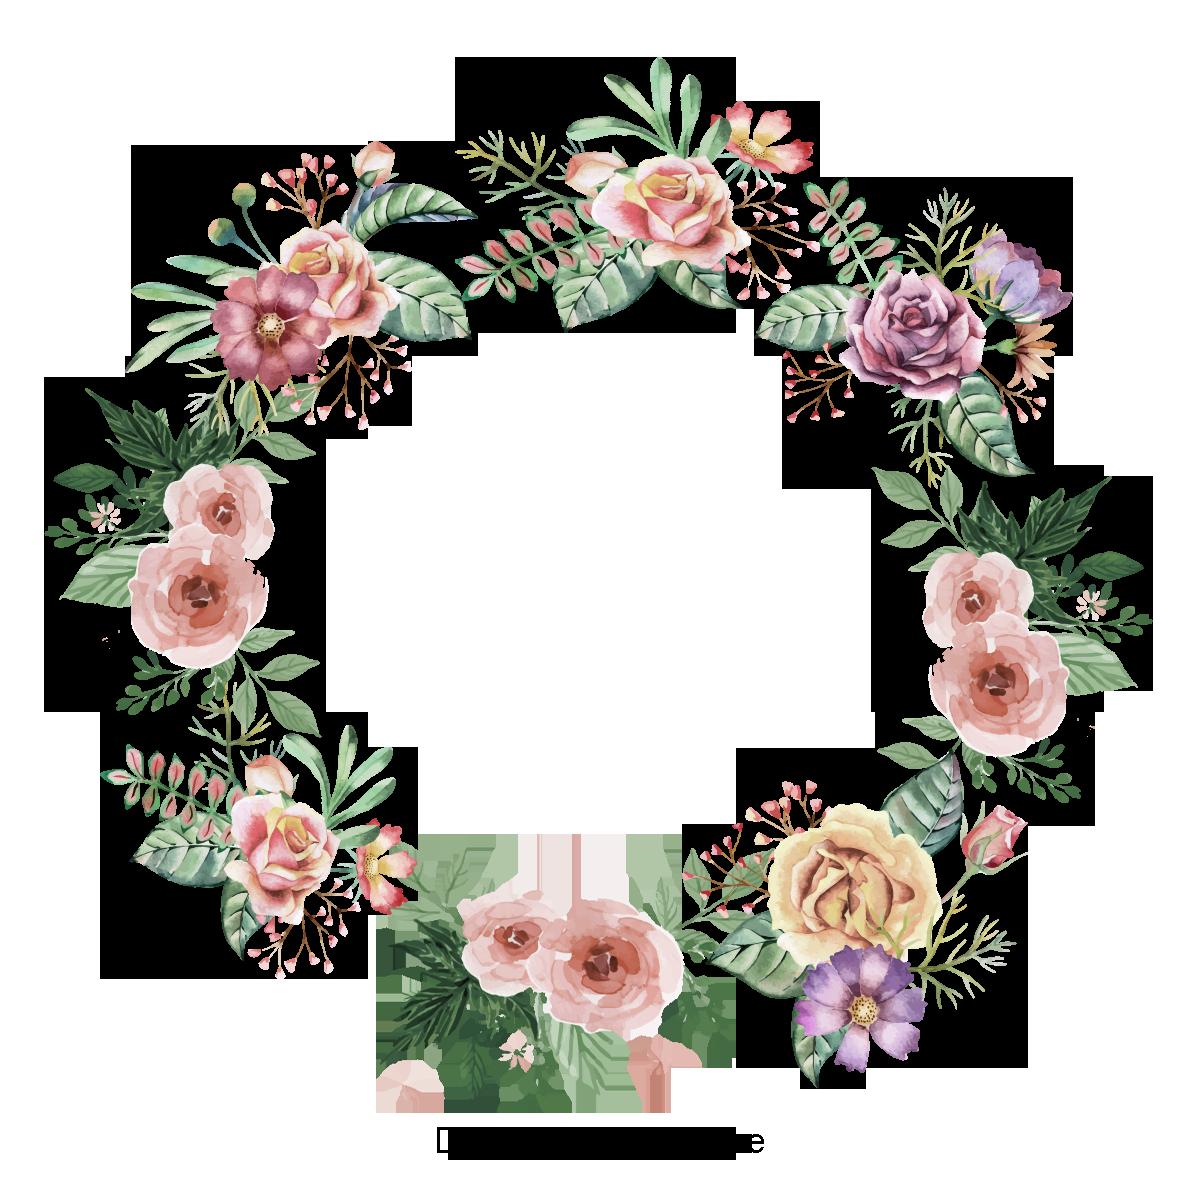 Krasivo Raspisannyj Venok Cvetok Vektor Cvetok Cvetochnyj Venok Png I Psd Fajl Png Dlya Besplatnoj Zagruzki Wreath Clip Art Vector Flowers Floral Wreath Watercolor